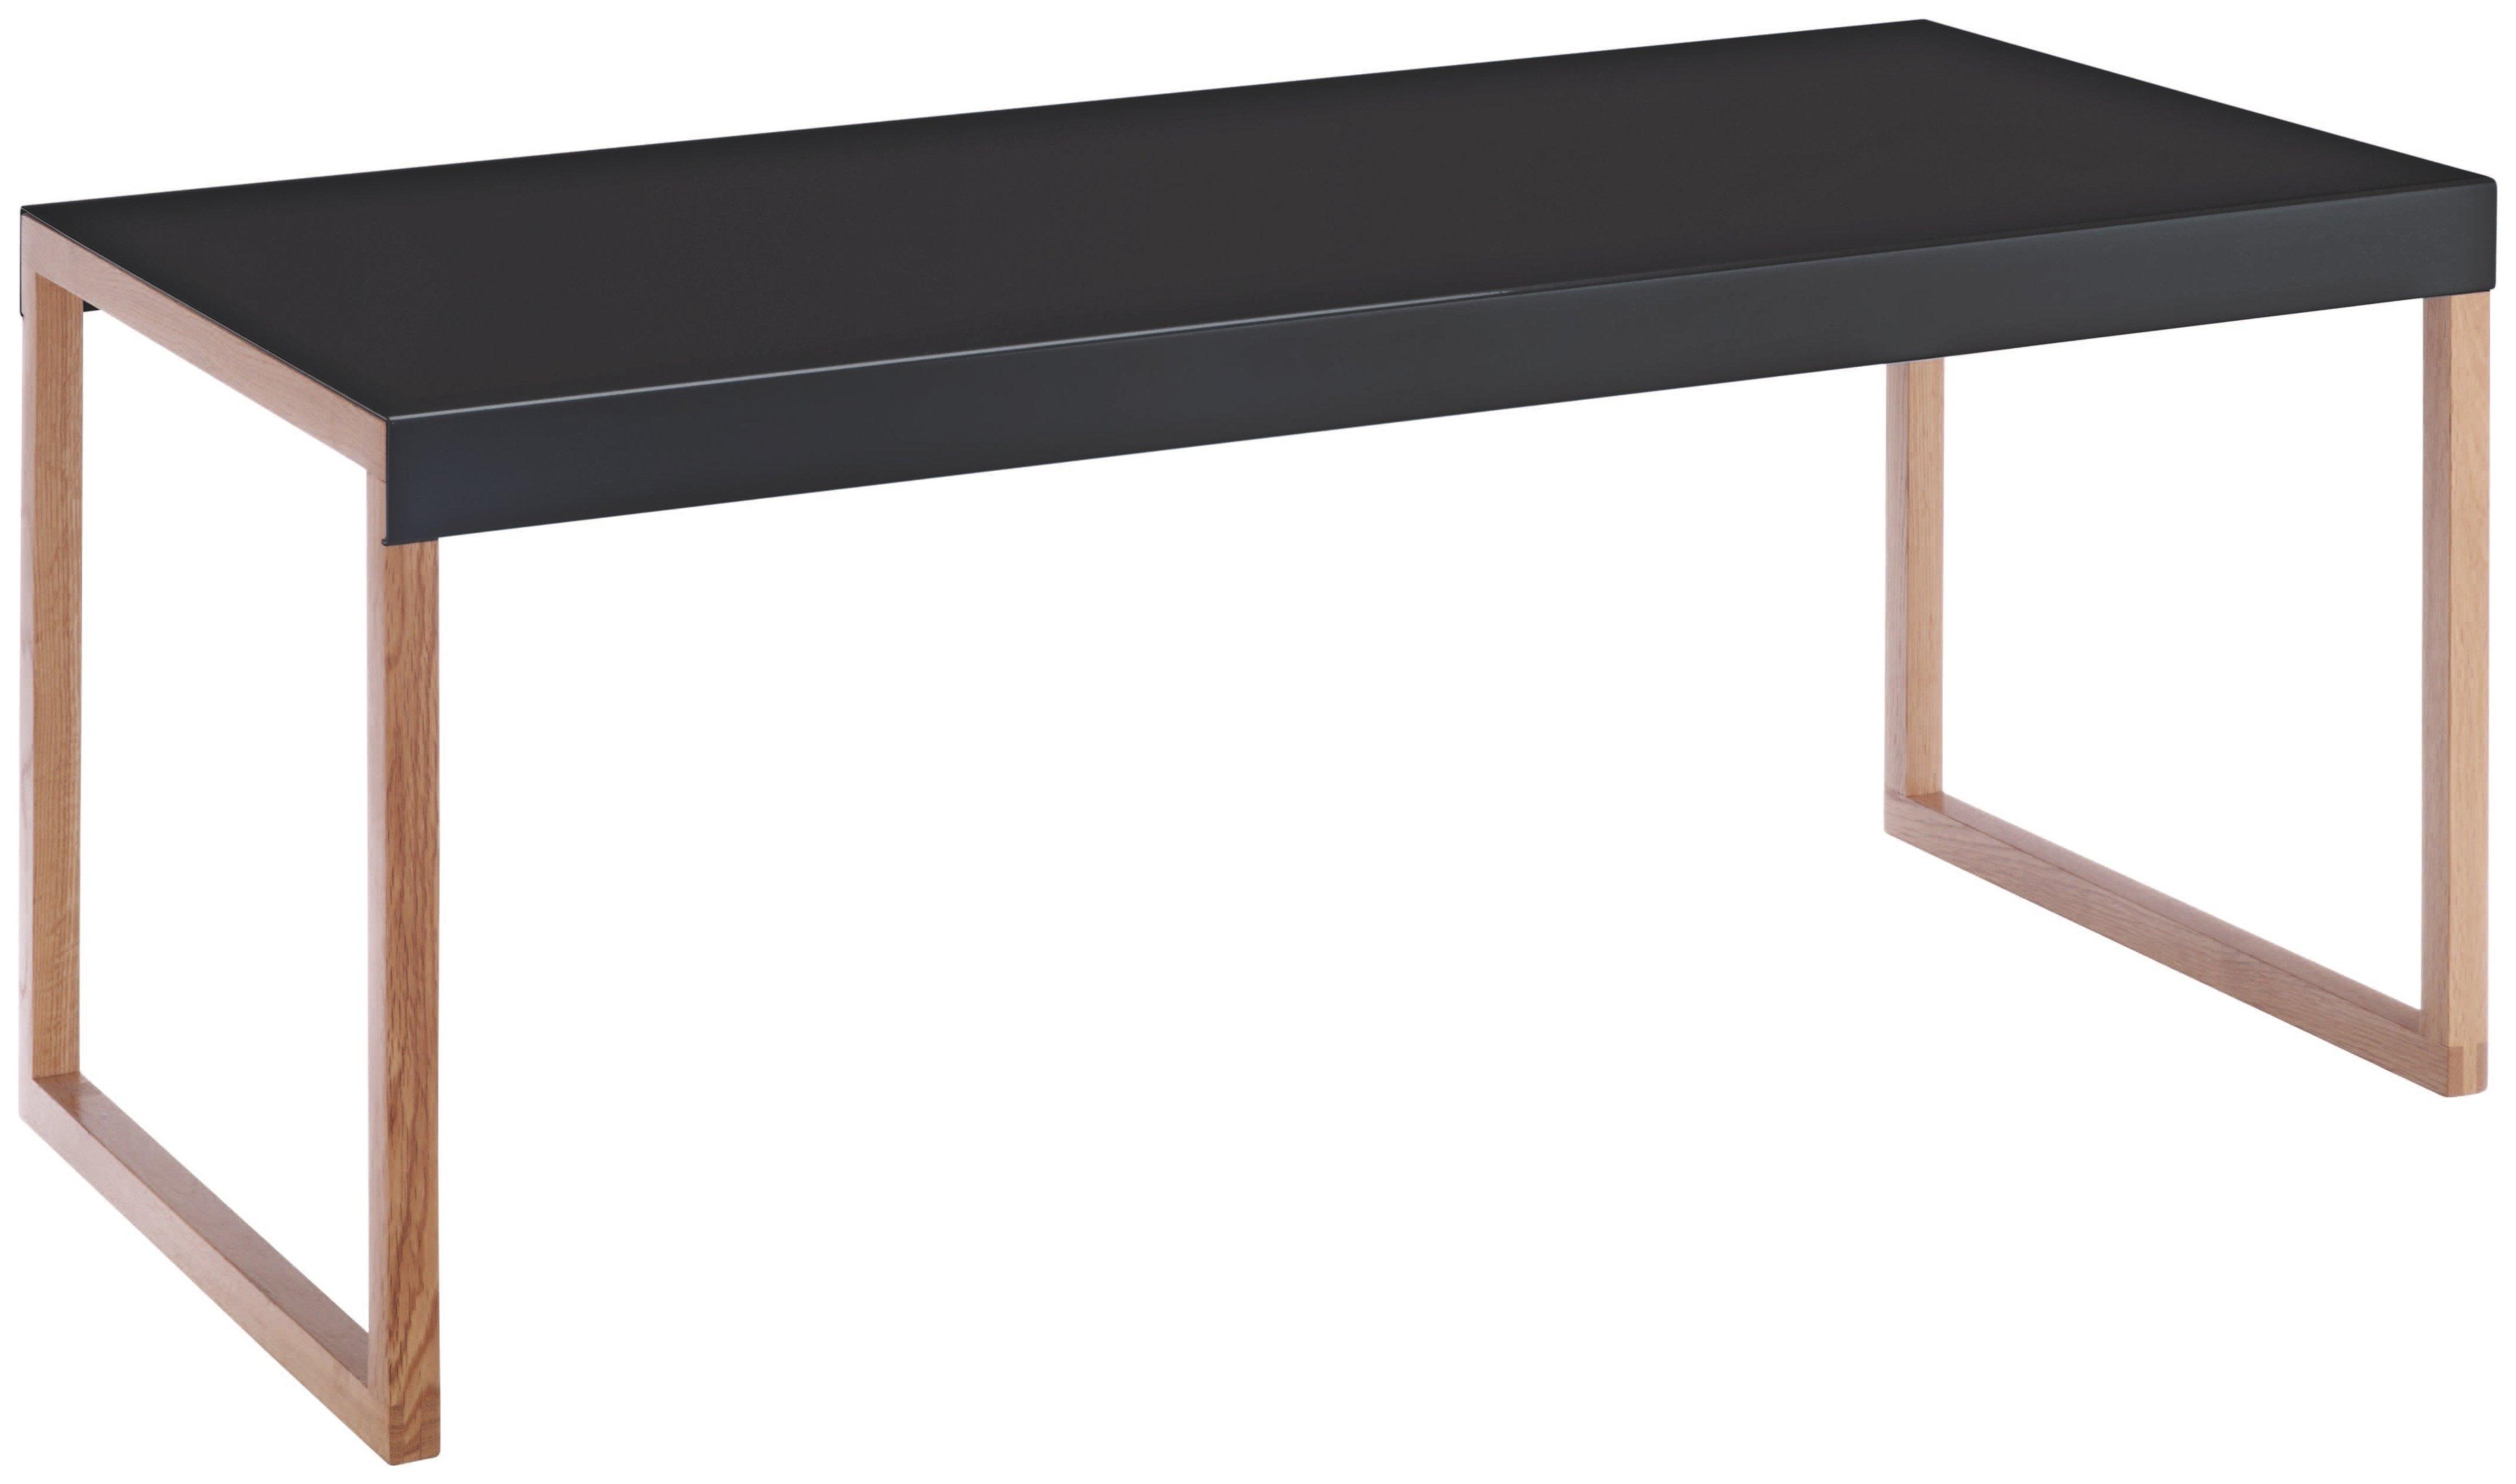 sale on habitat kilo oak legs long table black. Black Bedroom Furniture Sets. Home Design Ideas